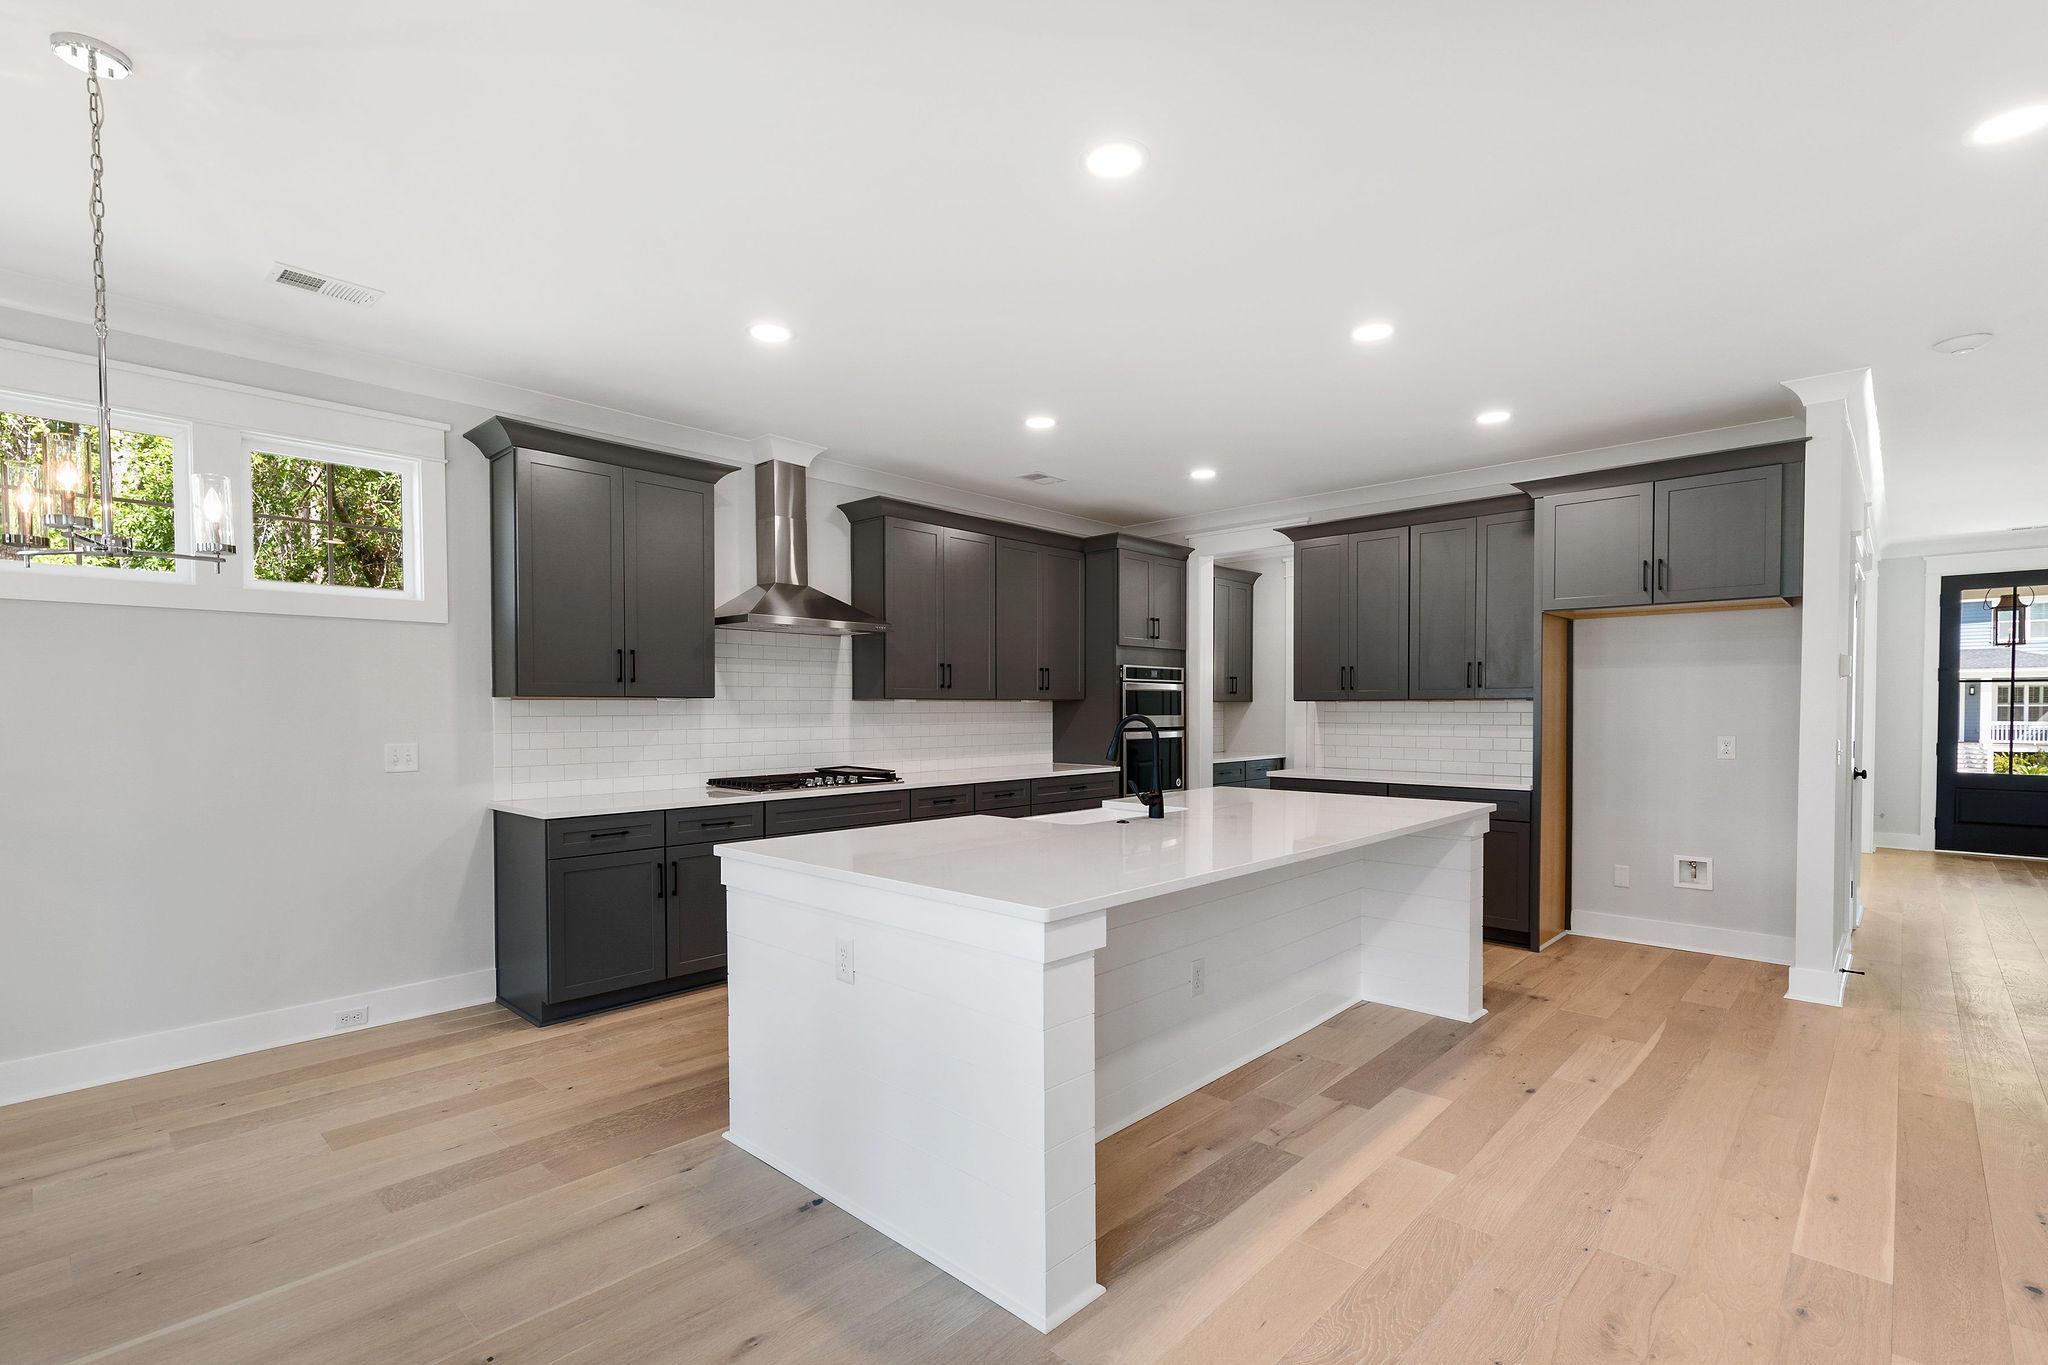 Park West Homes For Sale - 2291 Middlesex, Mount Pleasant, SC - 53